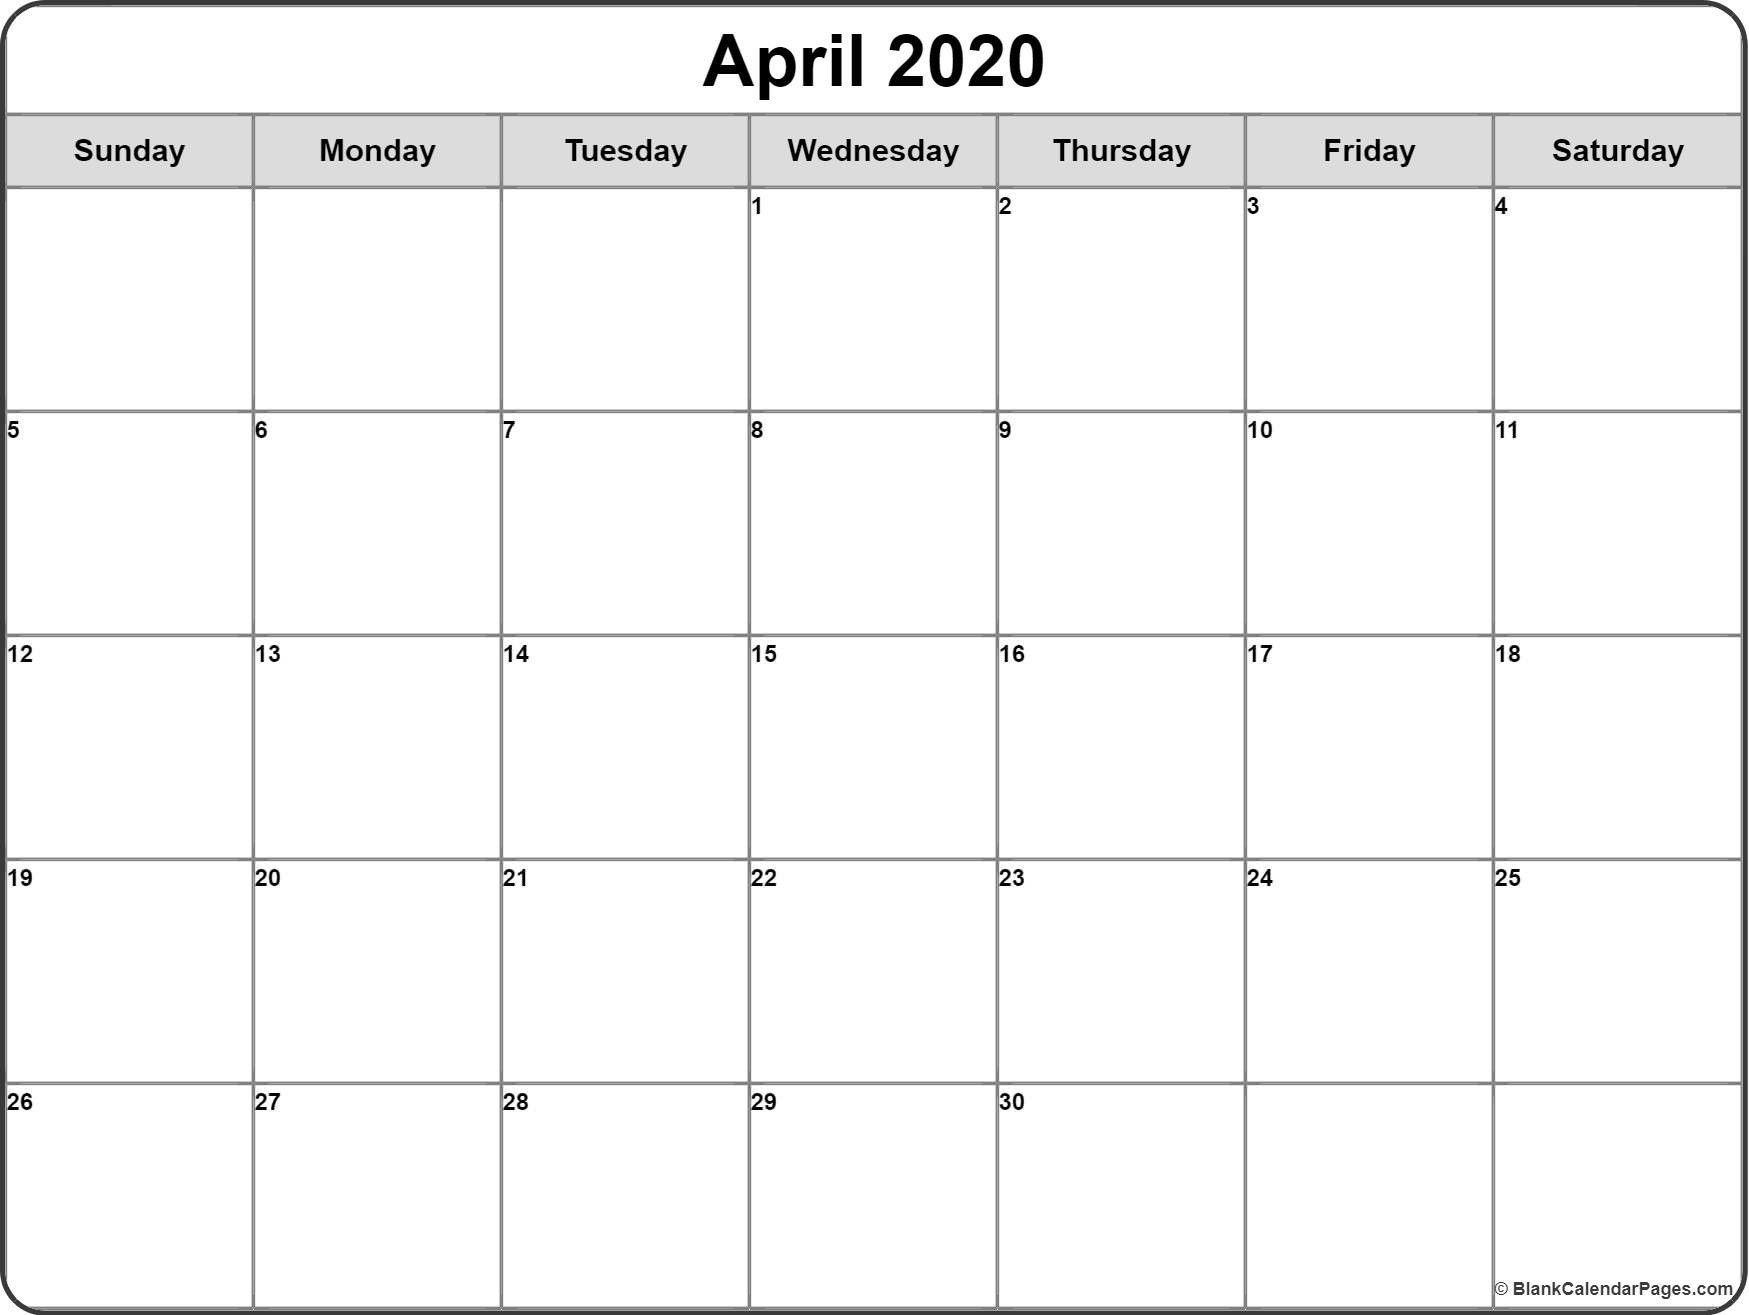 003 Striking June 2020 Monthly Calendar Template High Resolution Full